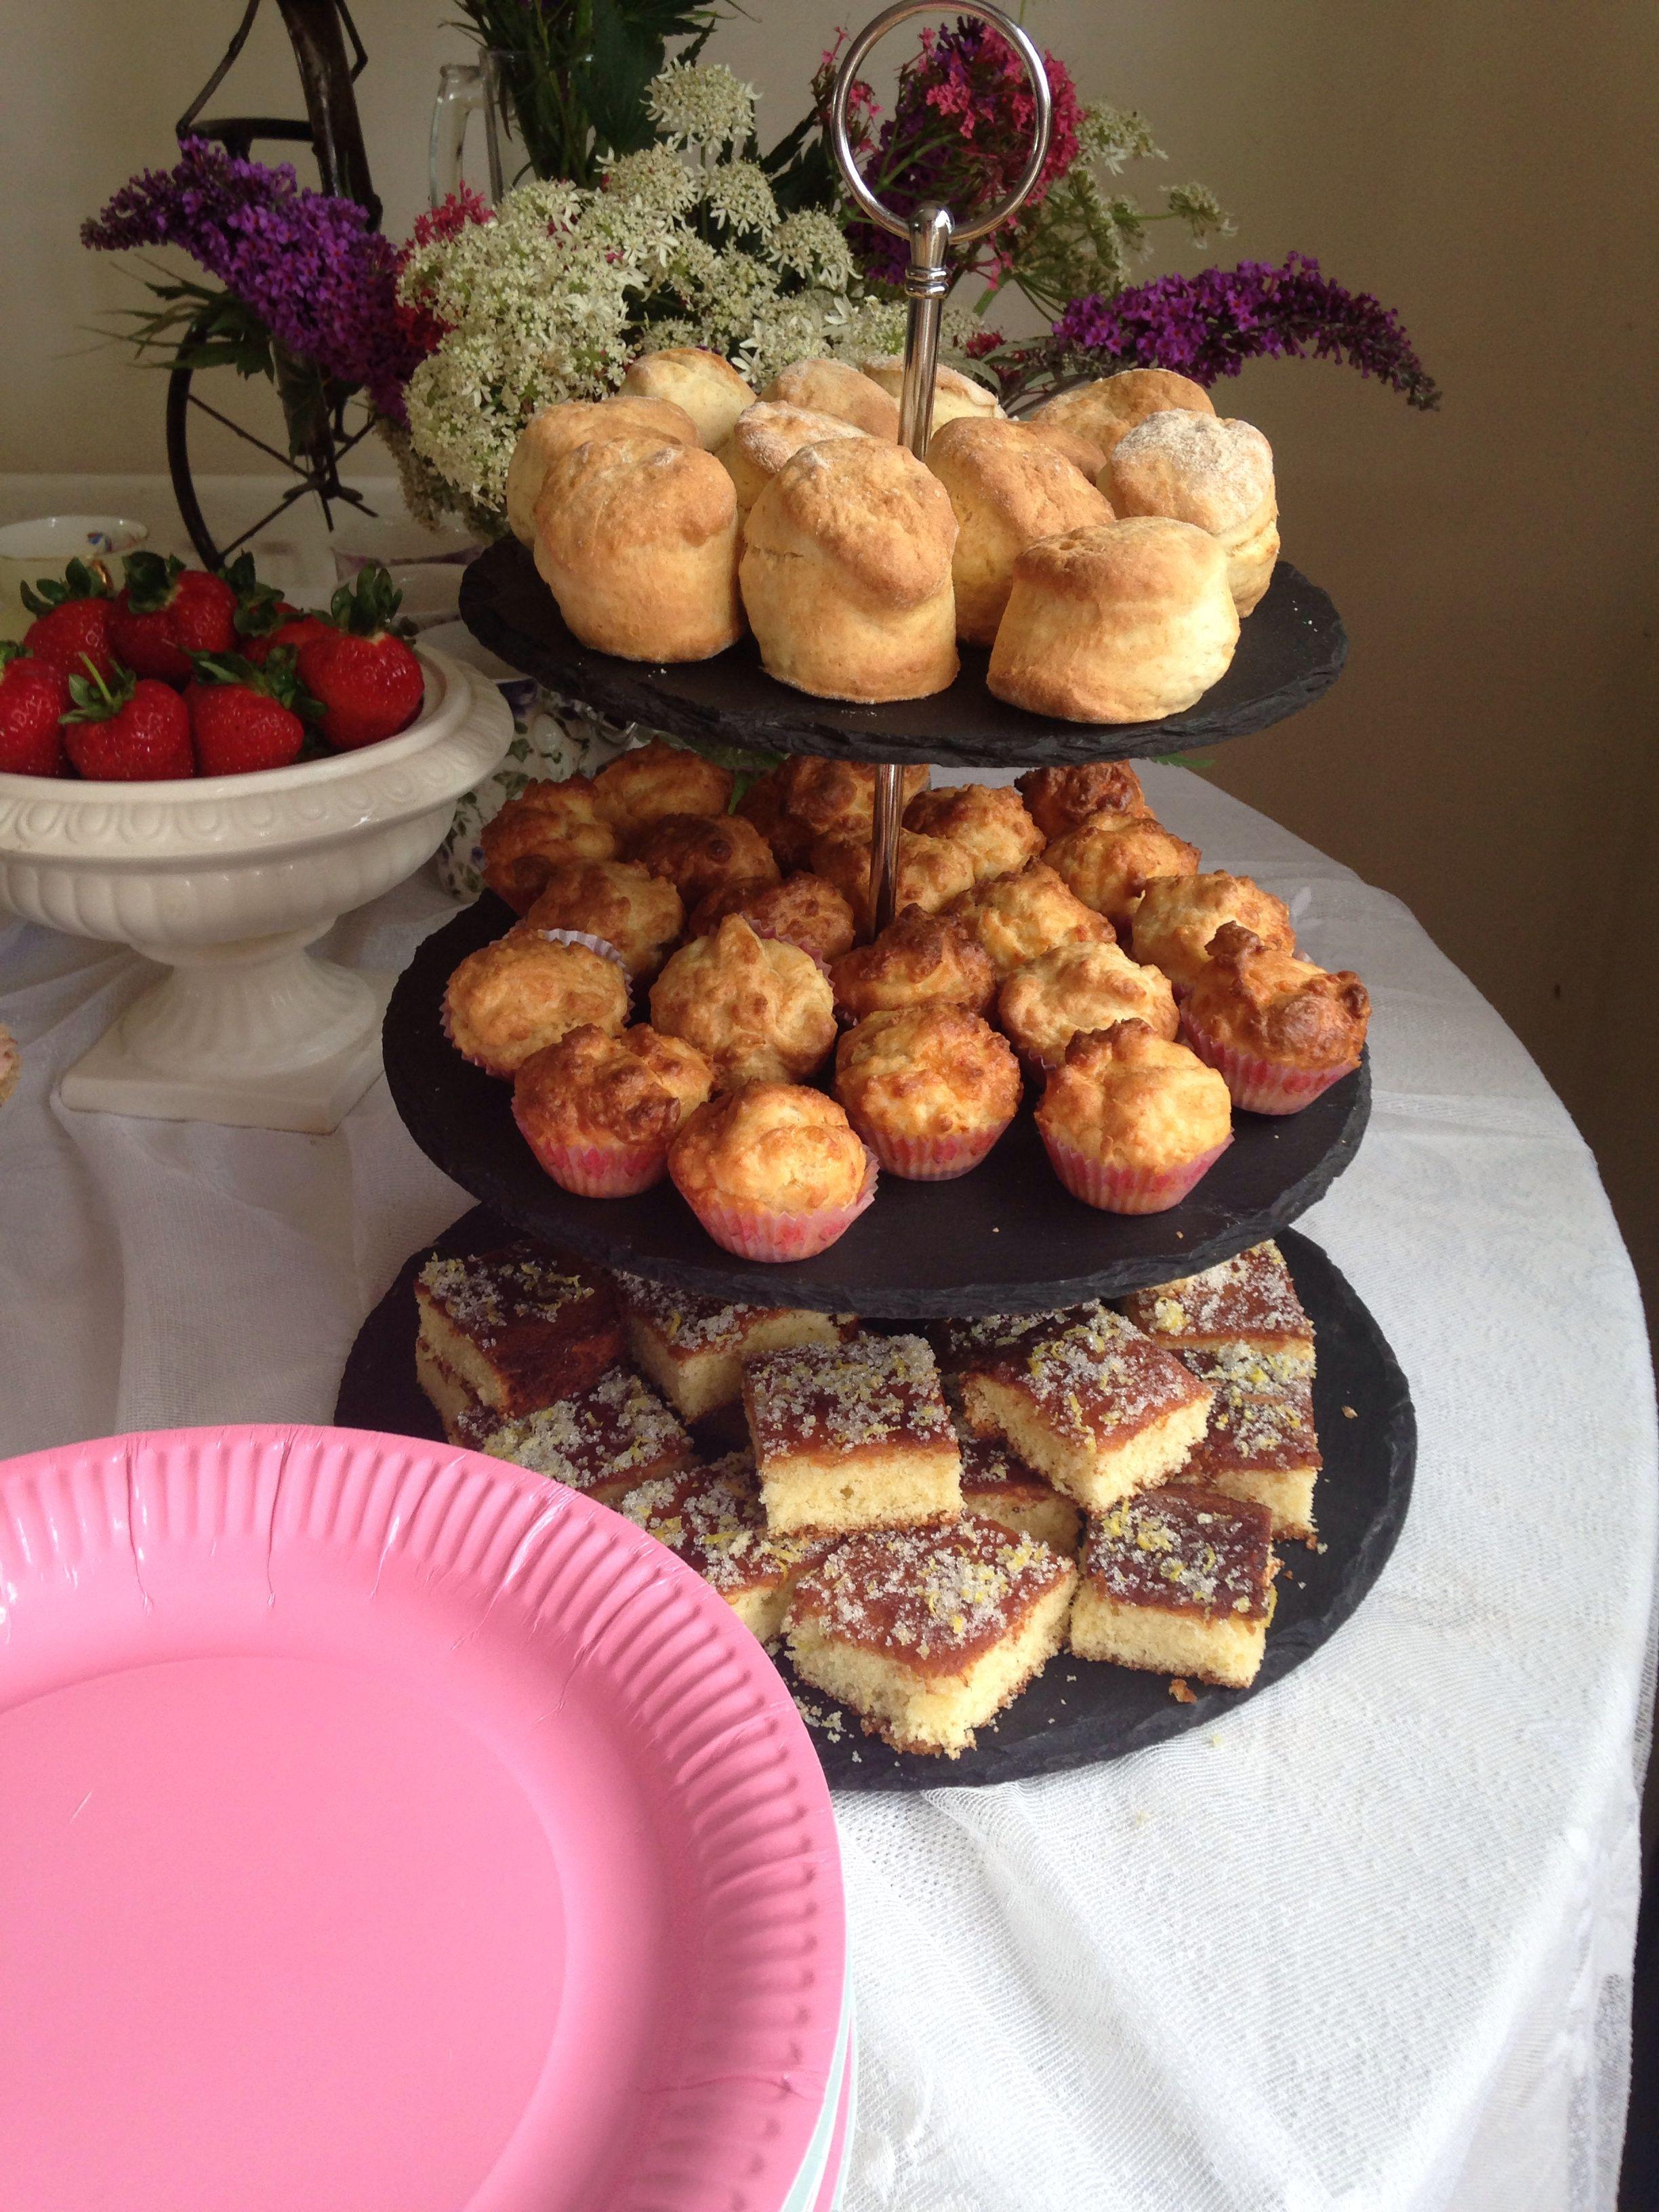 Julie's birthday tea .... Mini scones and cheese muffins